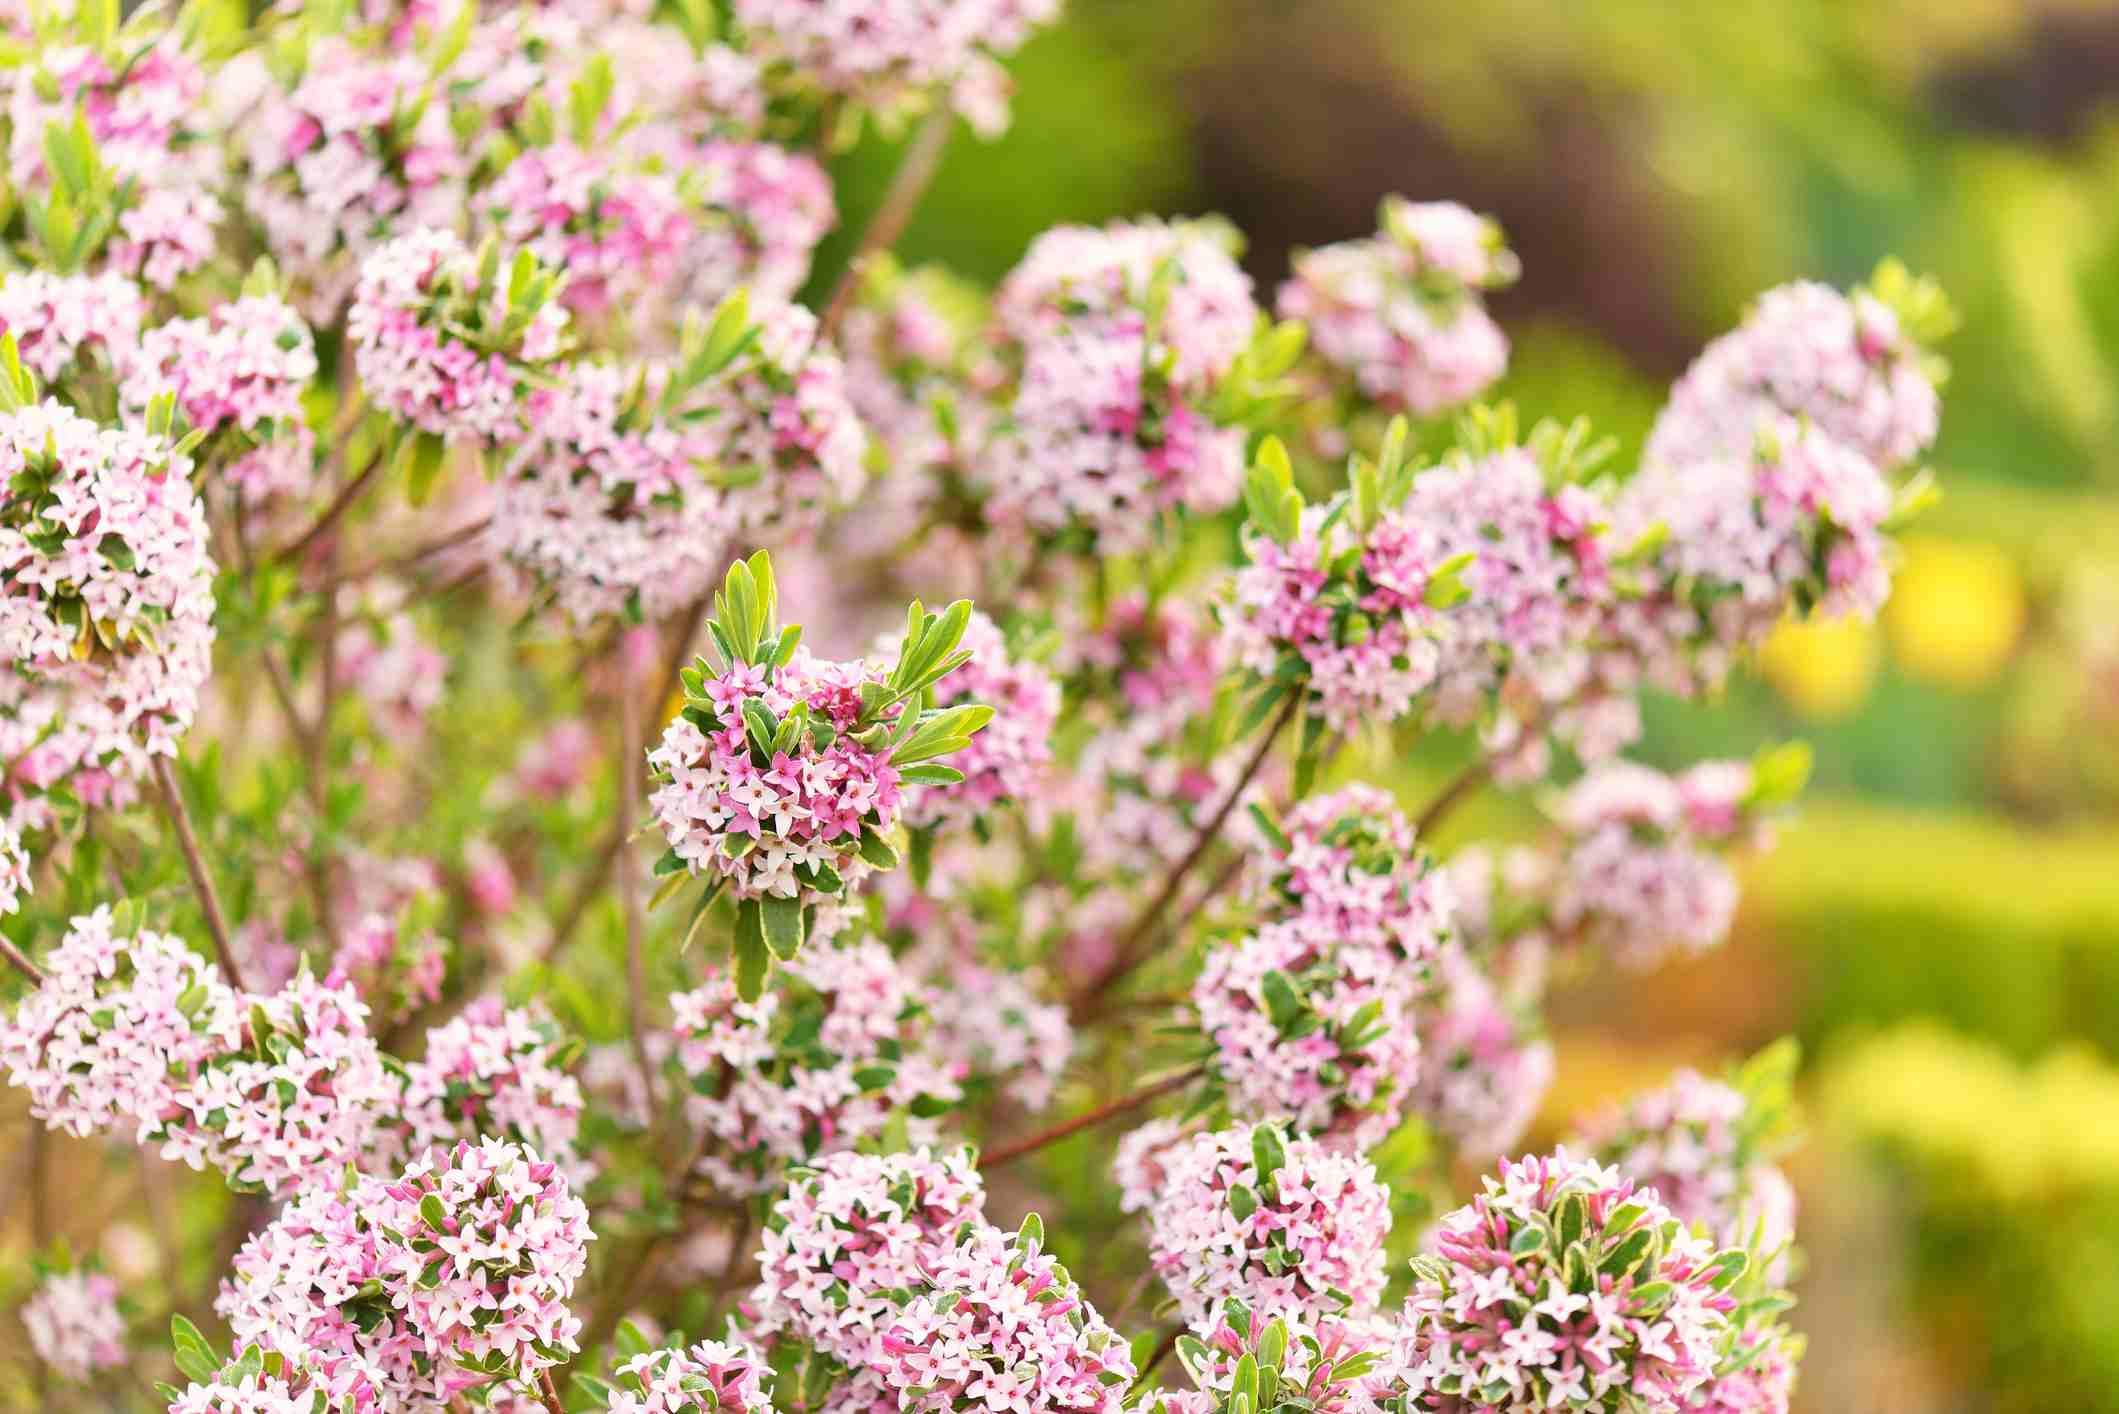 Daphne burkwoodii in bloom in pink.